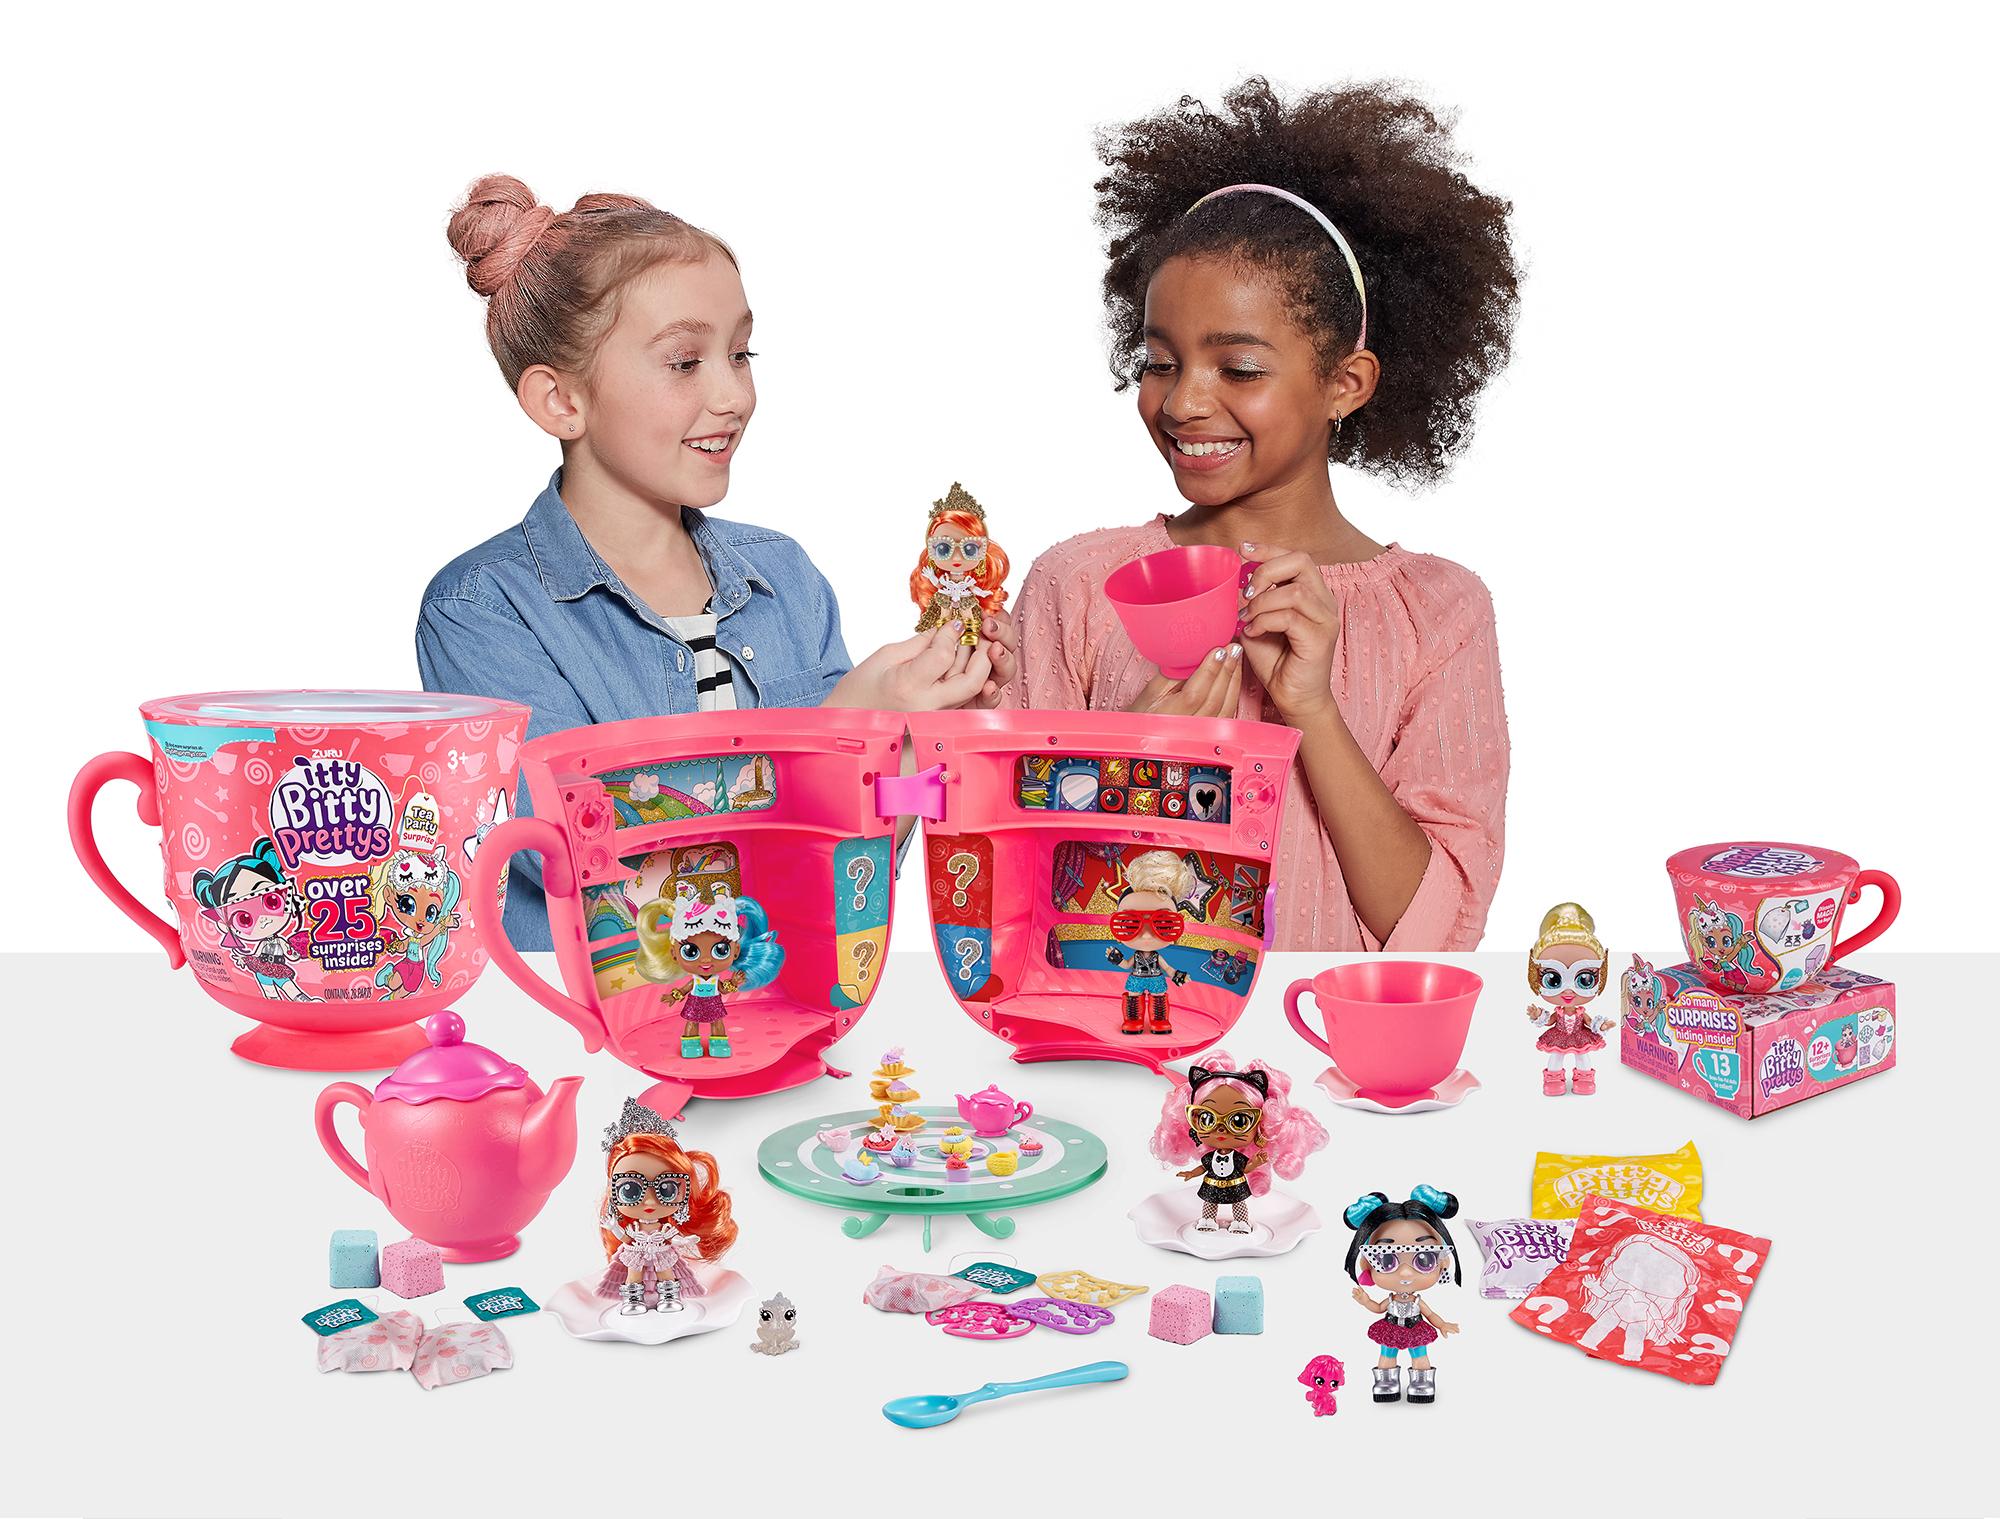 Itty Bitty Prettys Giant Teacup Playset